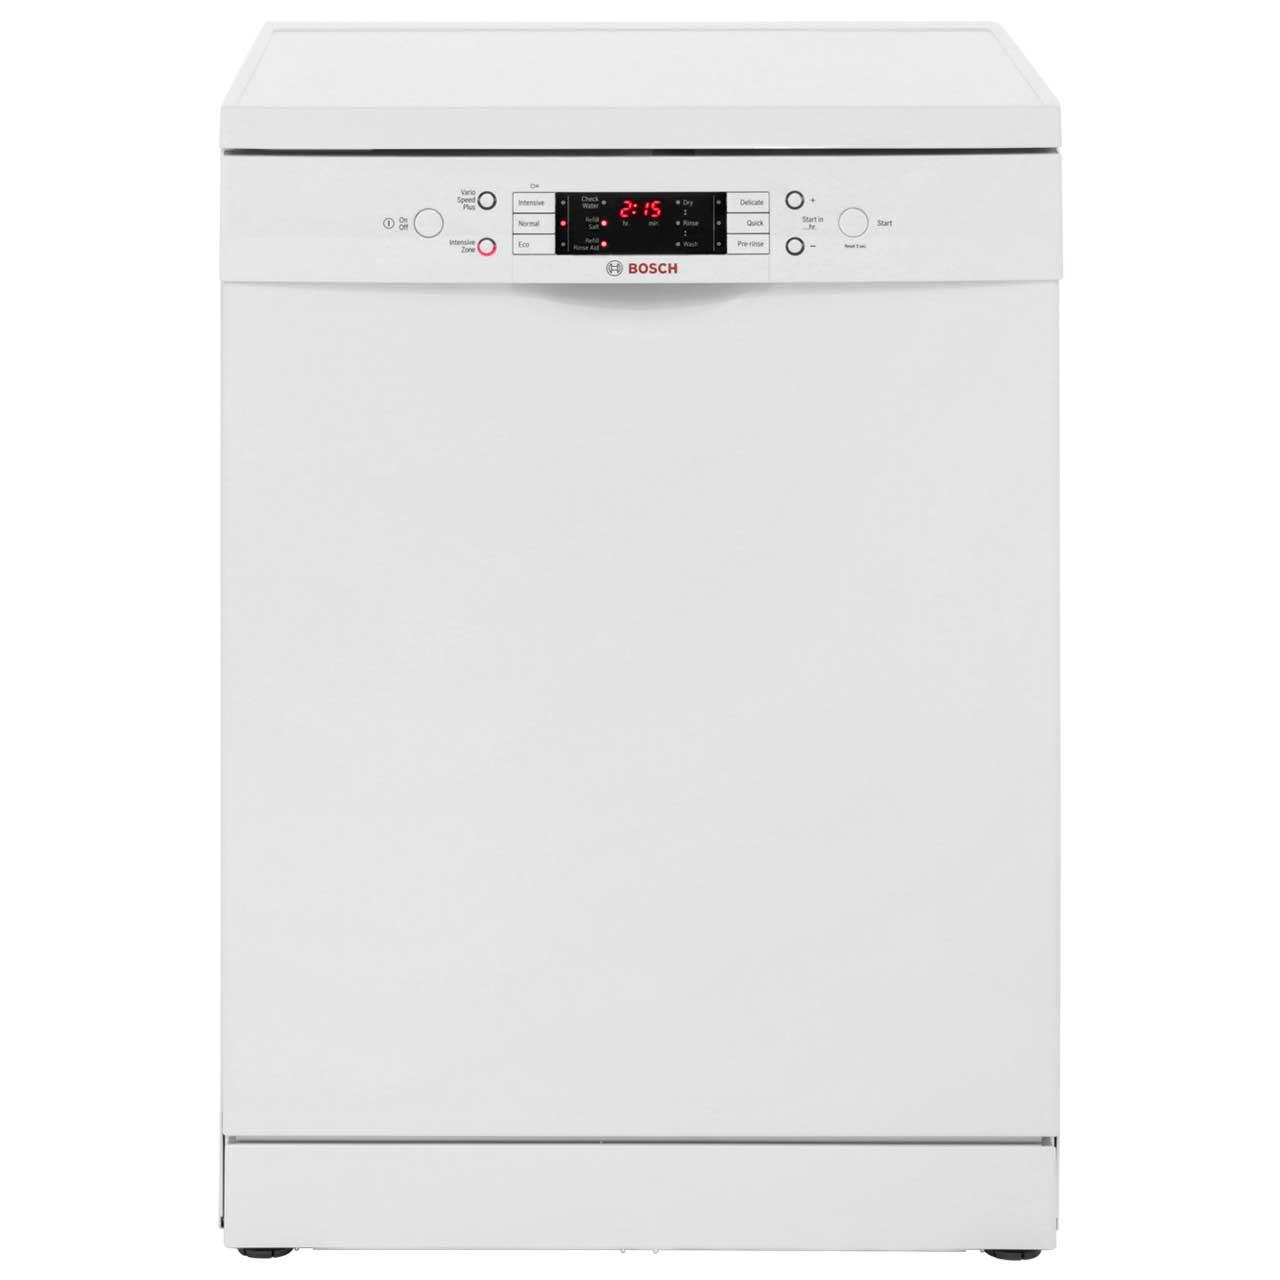 bosch serie 6 sms63m22gb standard dishwasher white 98332. Black Bedroom Furniture Sets. Home Design Ideas